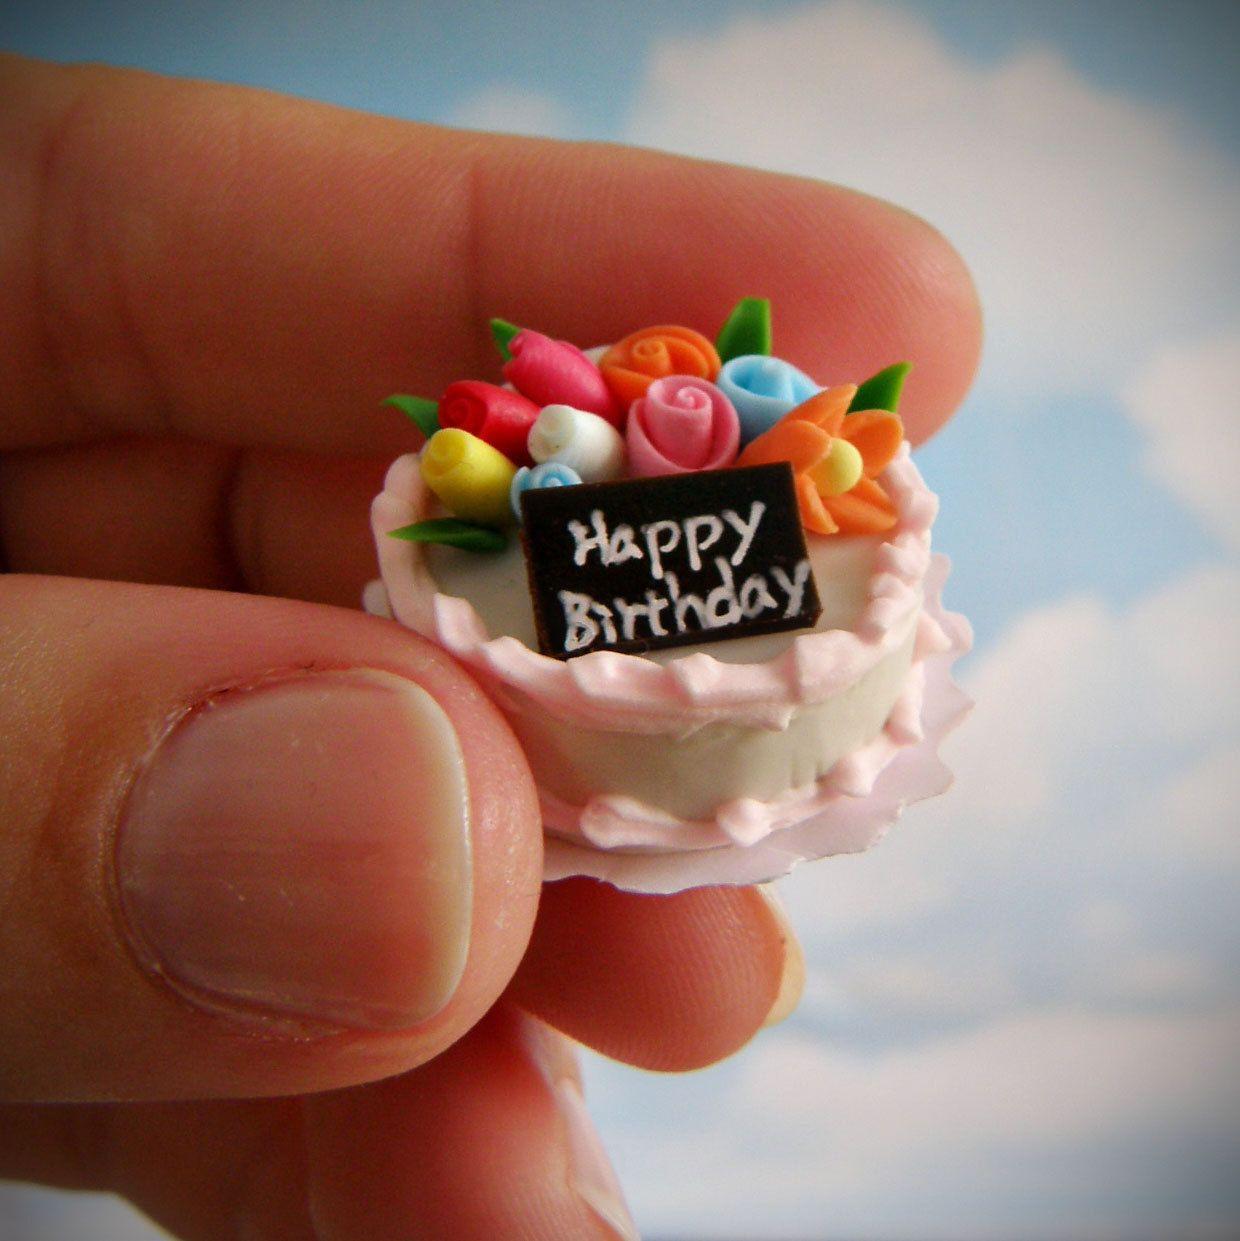 Swell Tiny Birthday Cake Google Birthday Miniatures Tiny Cakes Birthday Cards Printable Opercafe Filternl